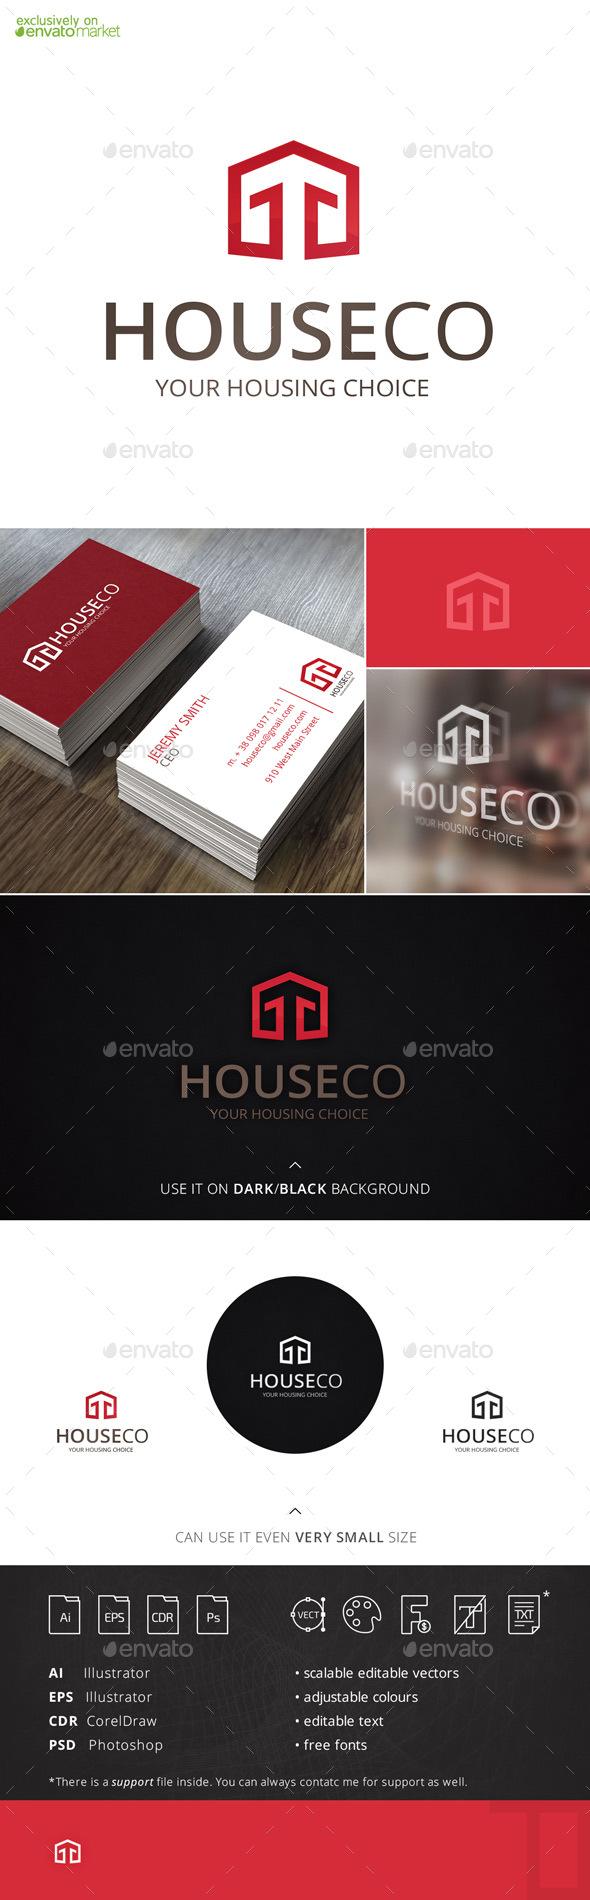 Houseco Housing Logo Template - Buildings Logo Templates